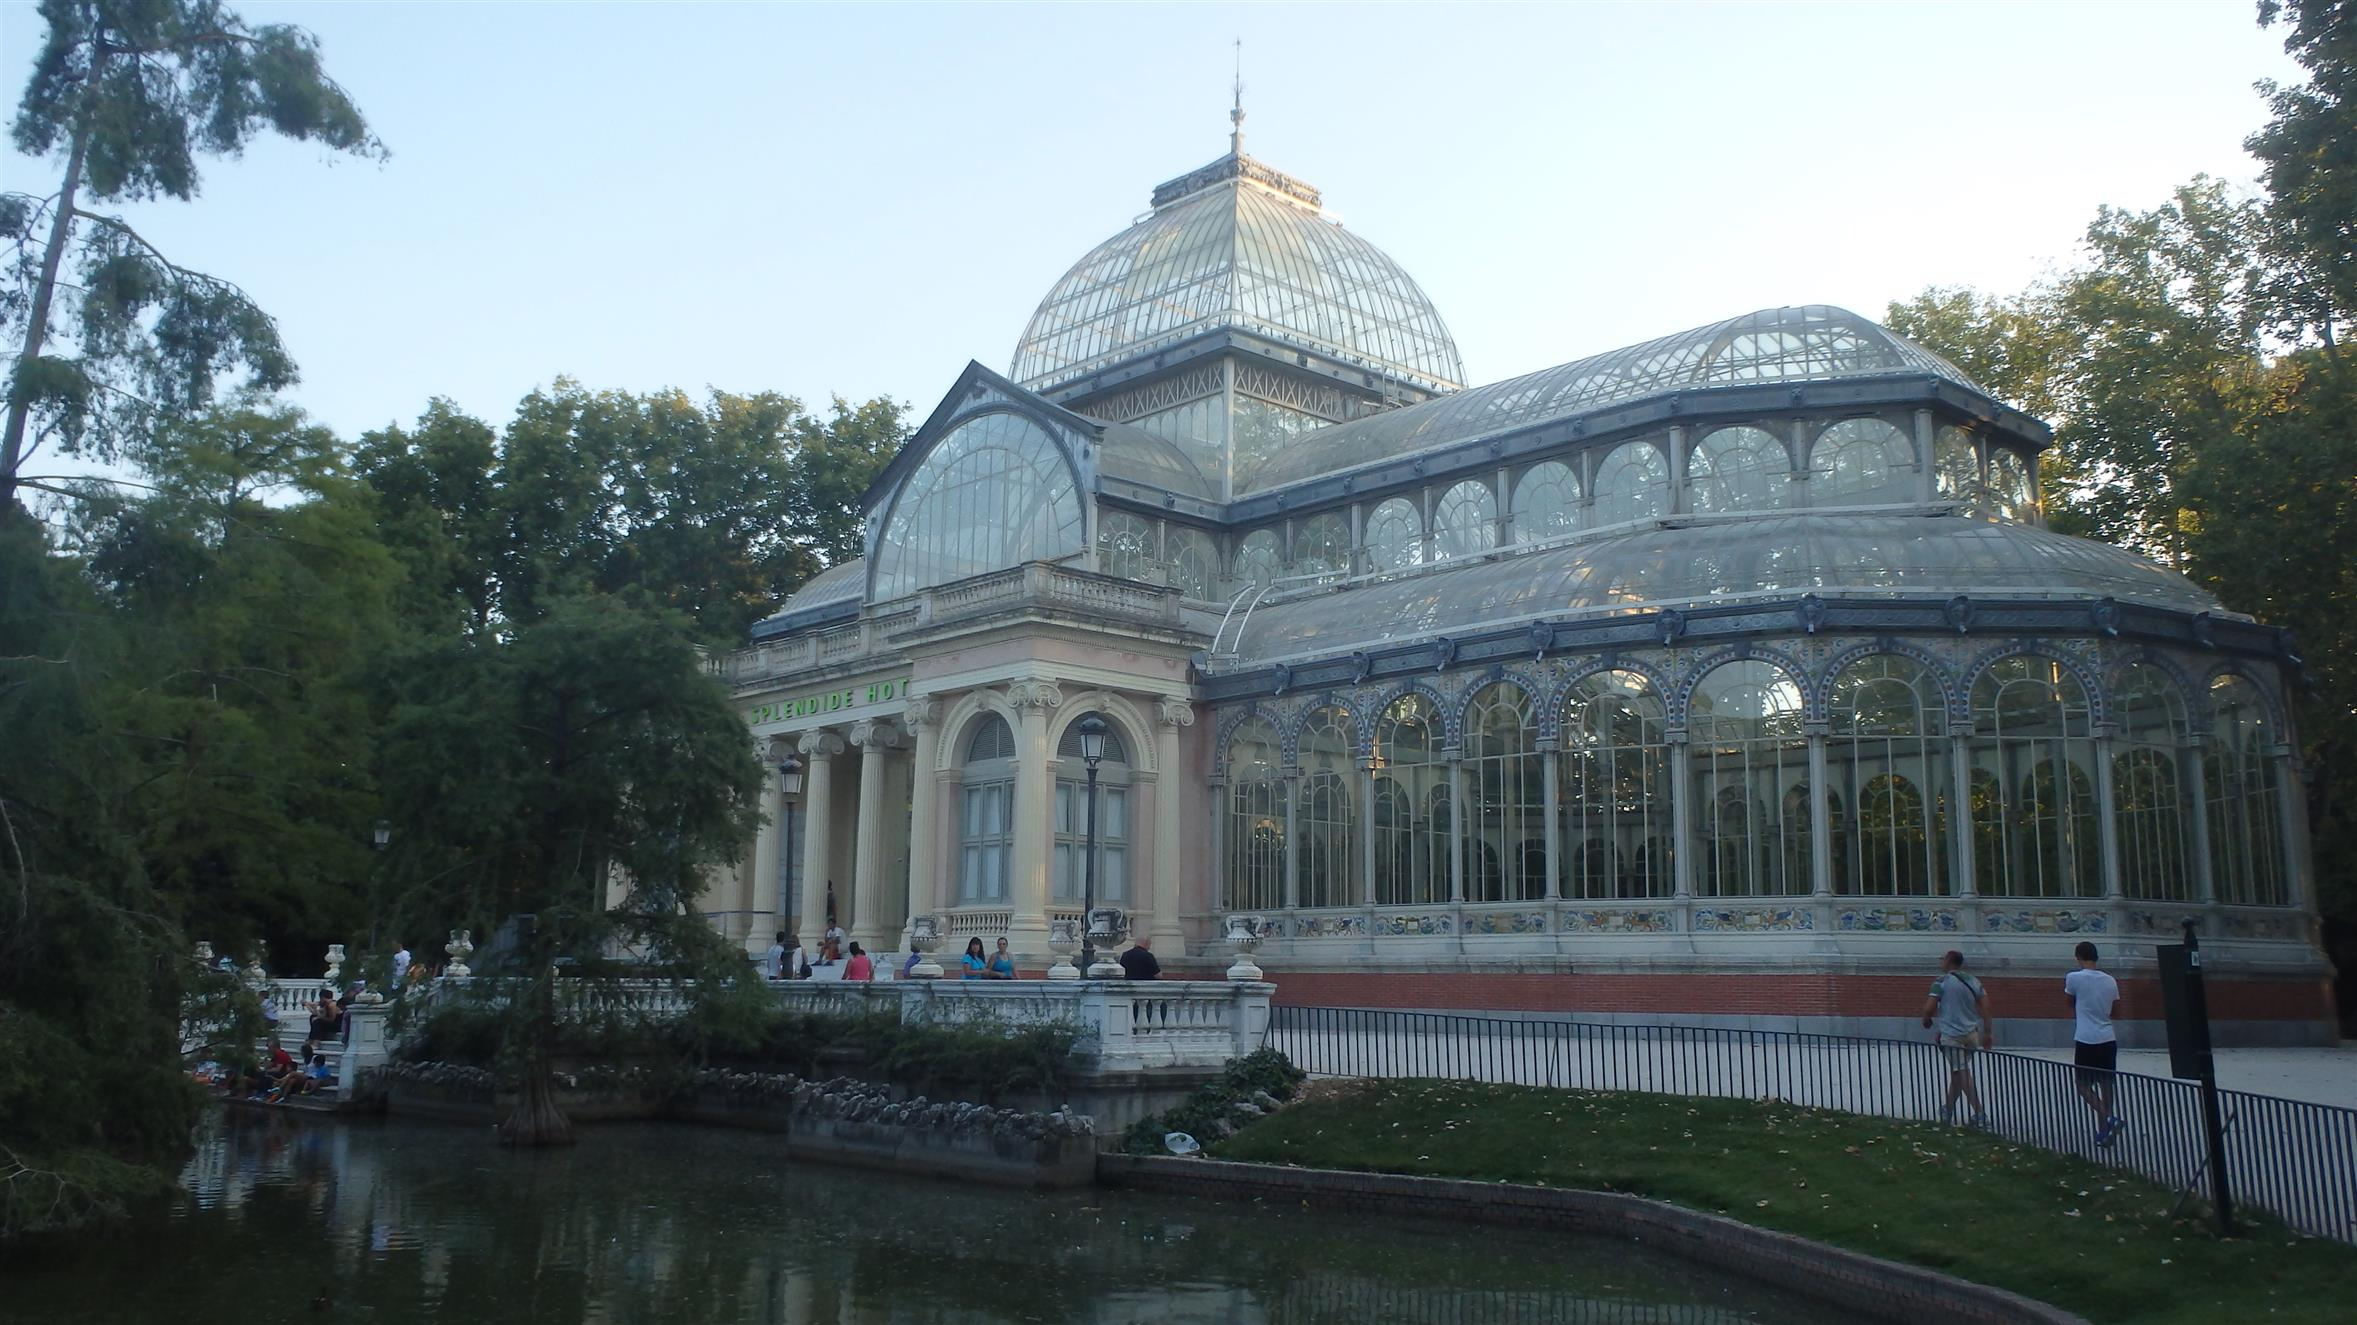 Madriddu vent dans les voiles for Jardin 19eme siecle